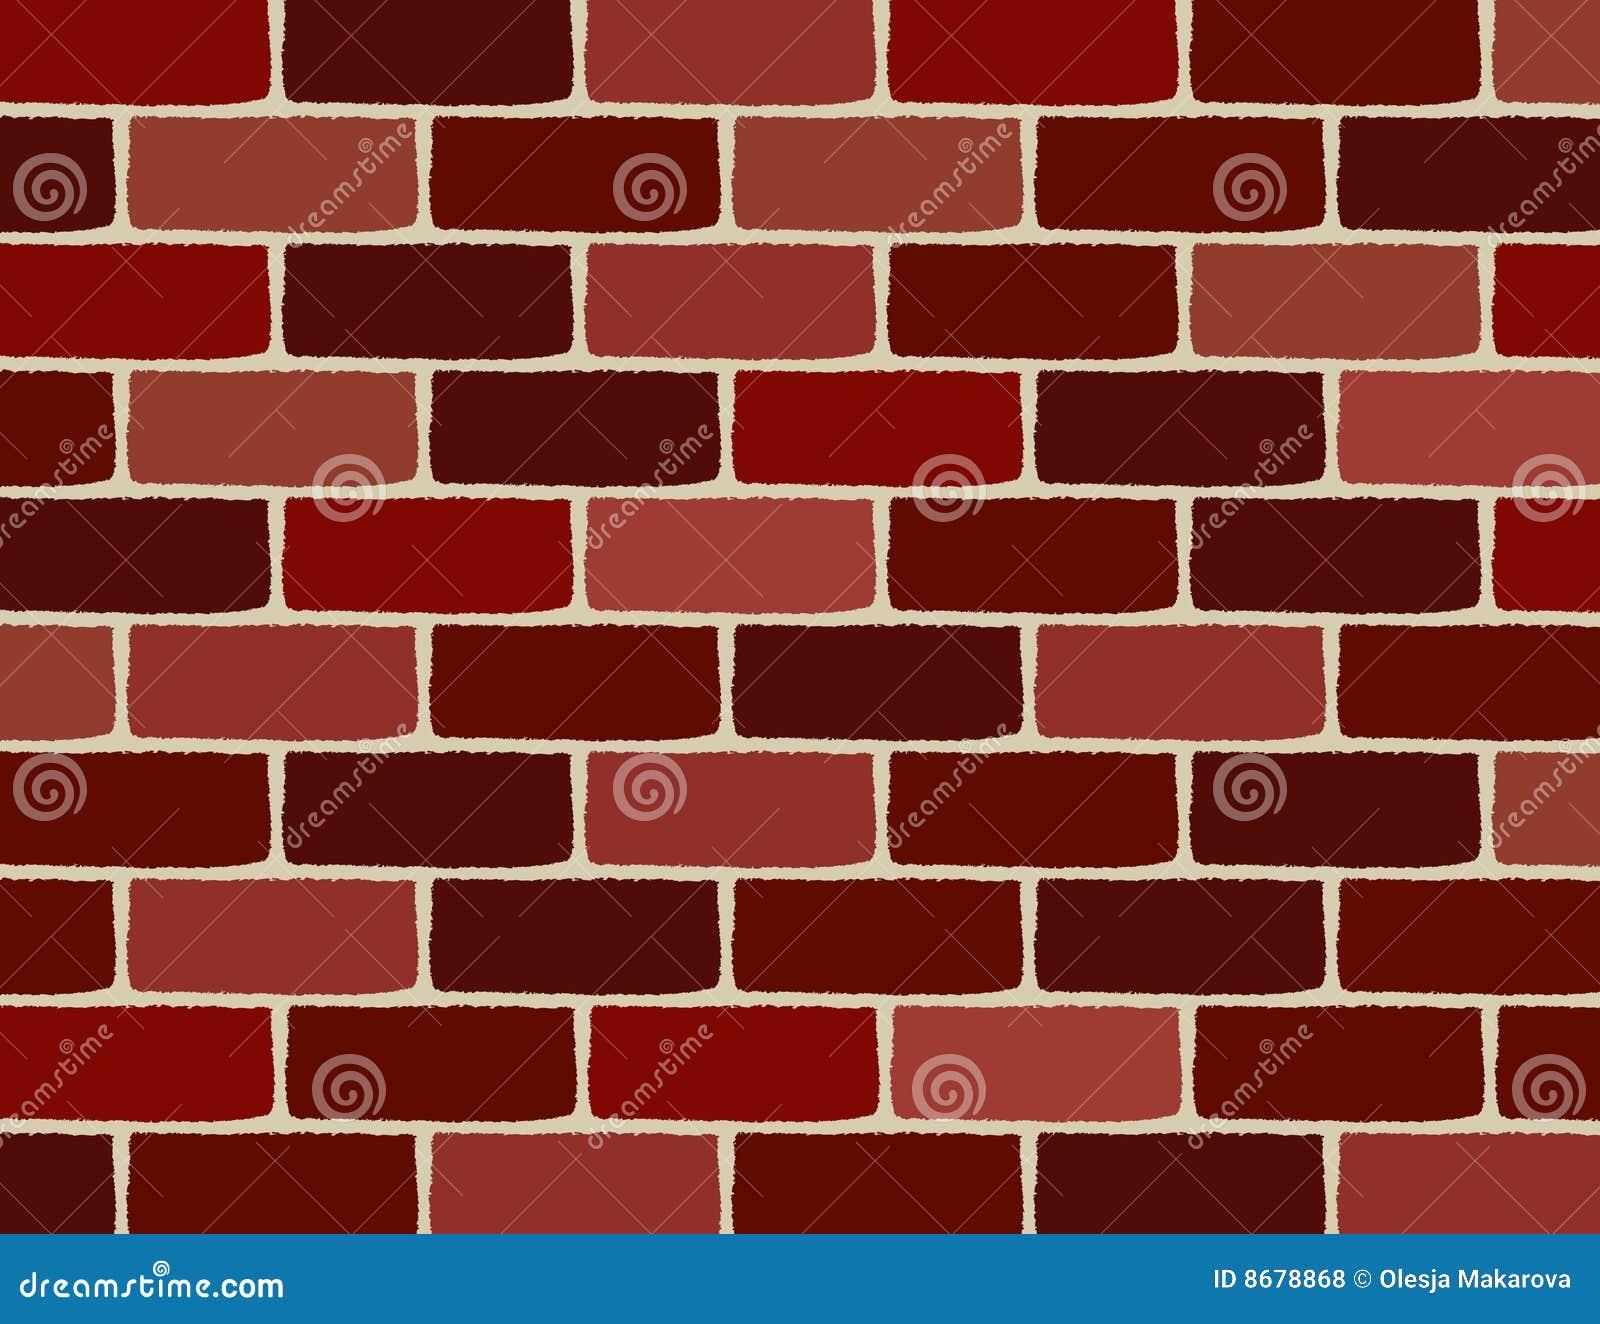 Vector Brick Wall Stock Vector Illustration Of Building